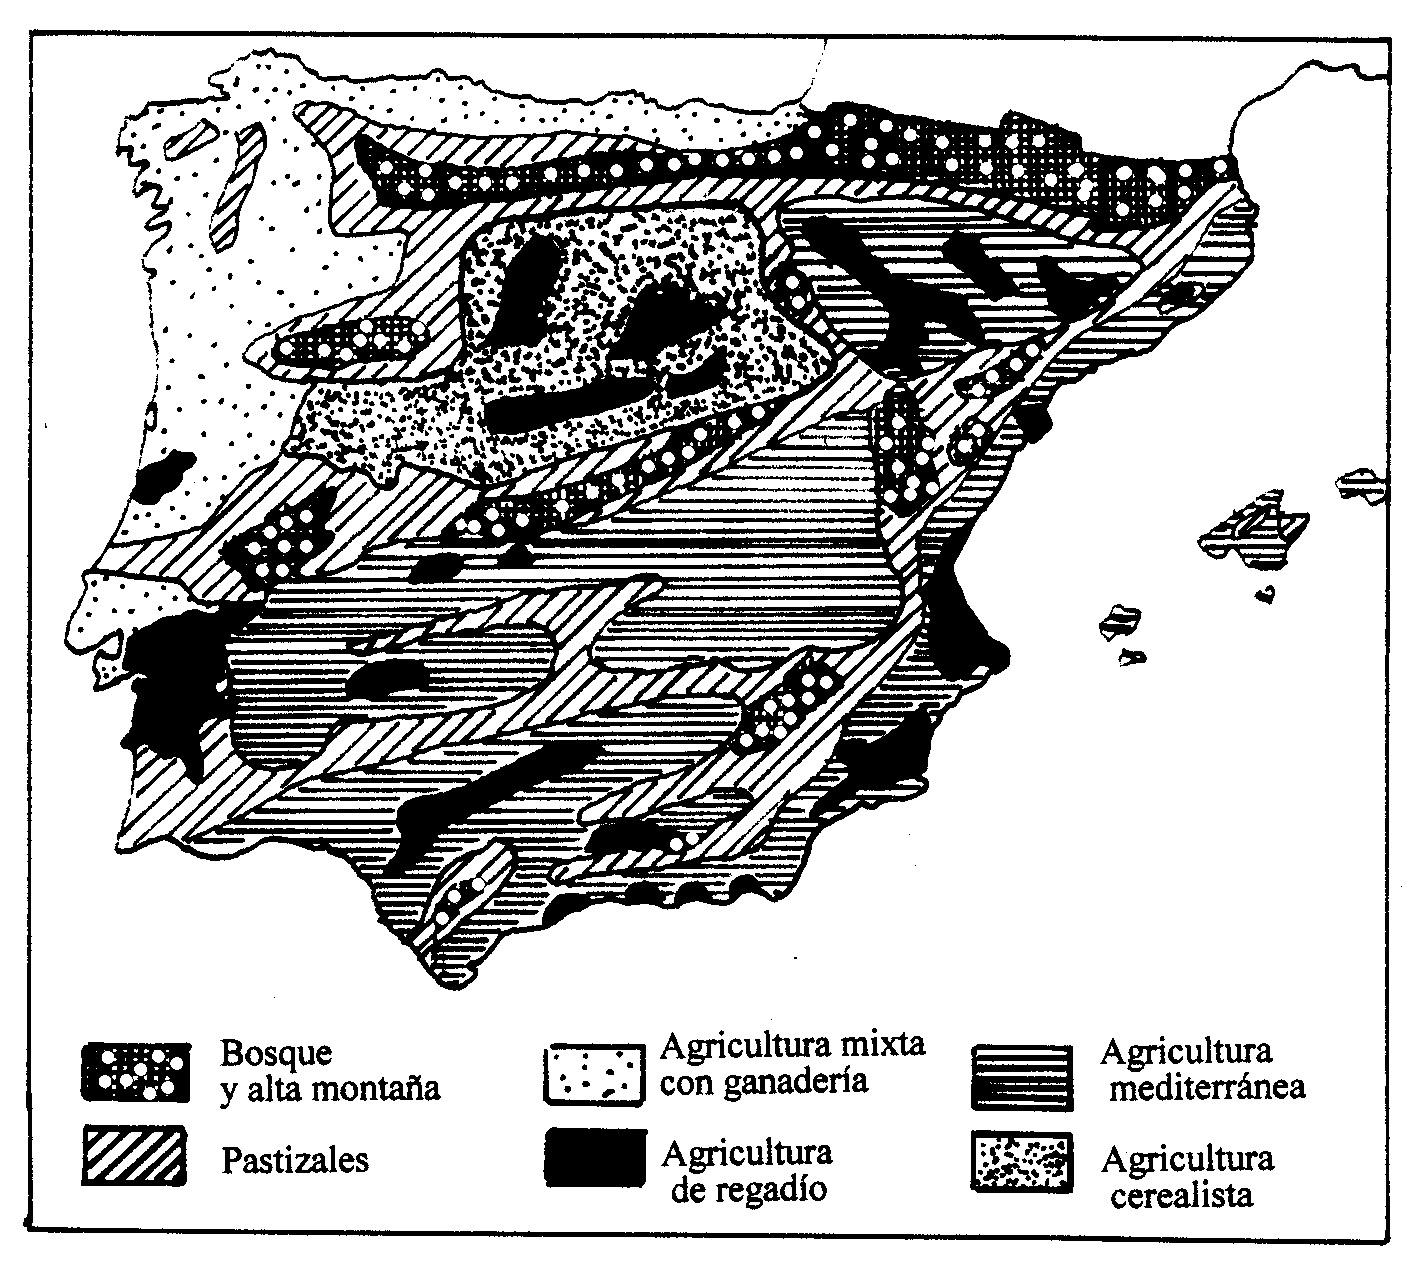 geograf u00cda e historia jes u00das villar  2 u00ba bach  agricultura en